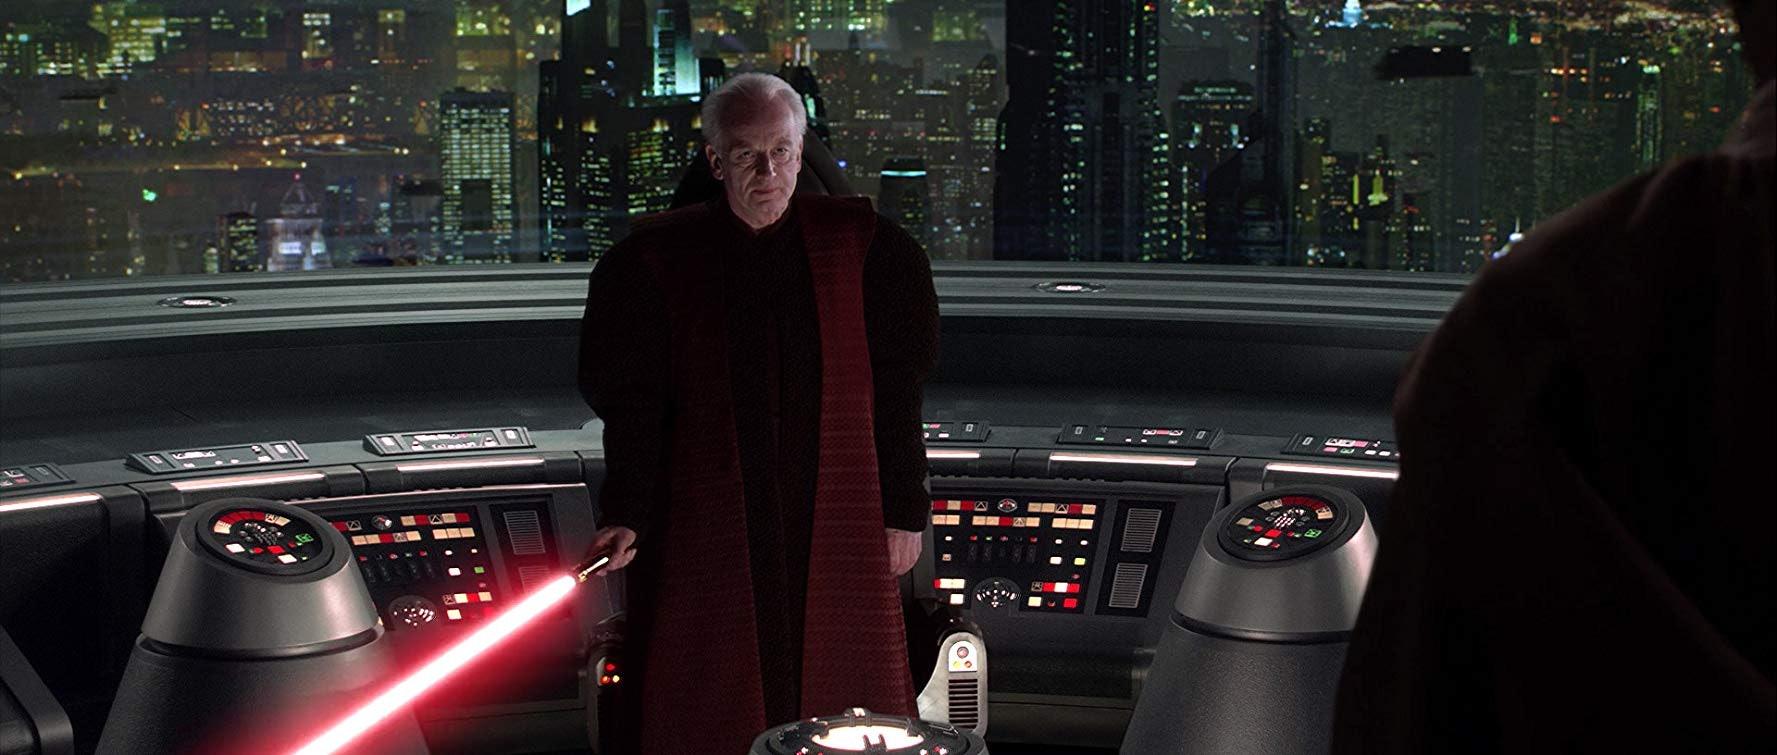 Ian McDiarmid as Senator Palpatine in 'Star Wars: Episode III - Revenge of the Sith'